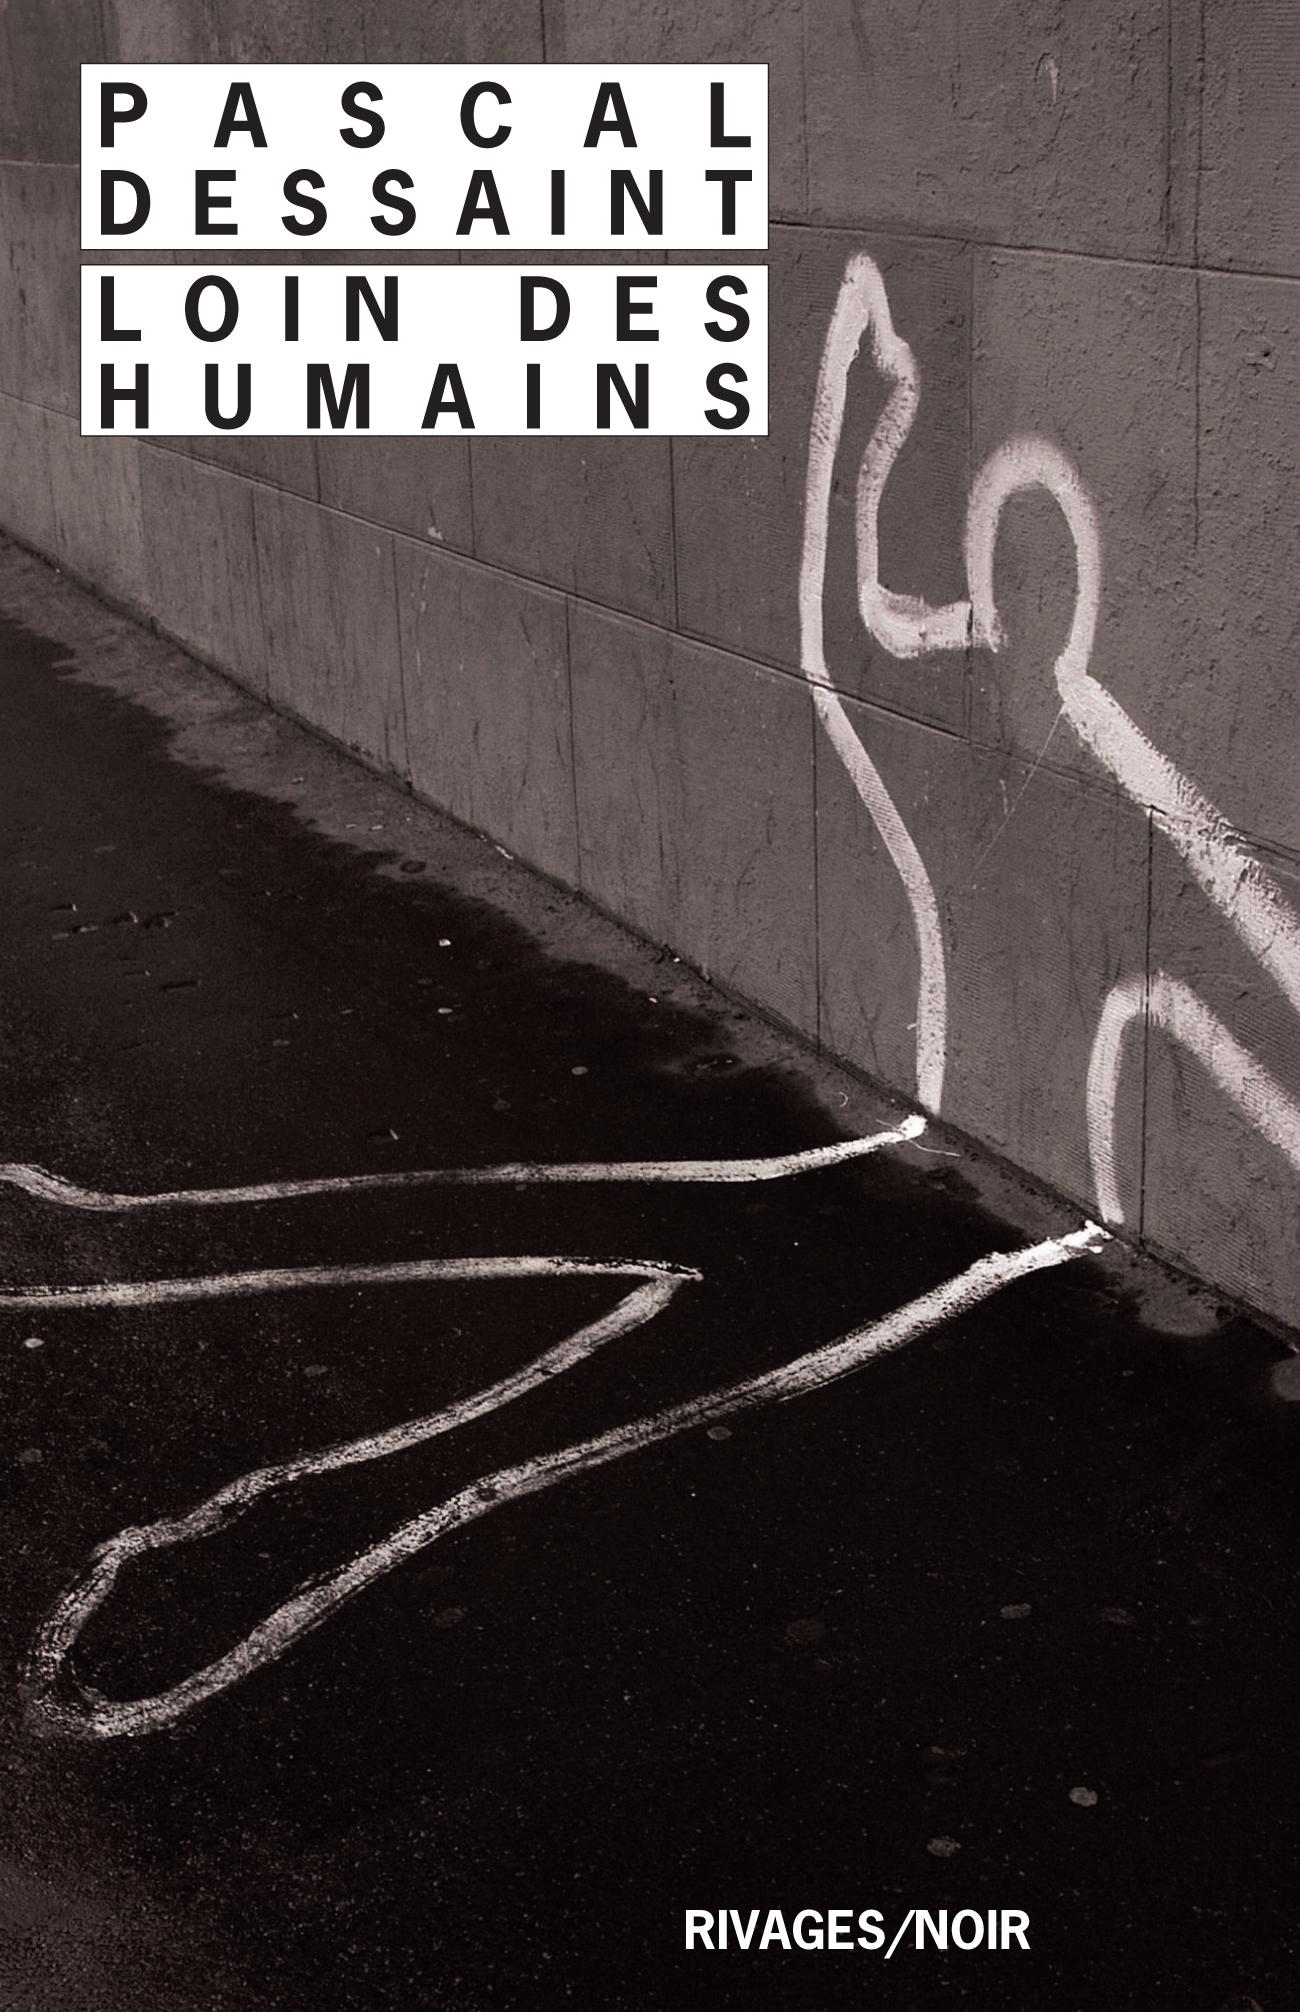 Loin des humains